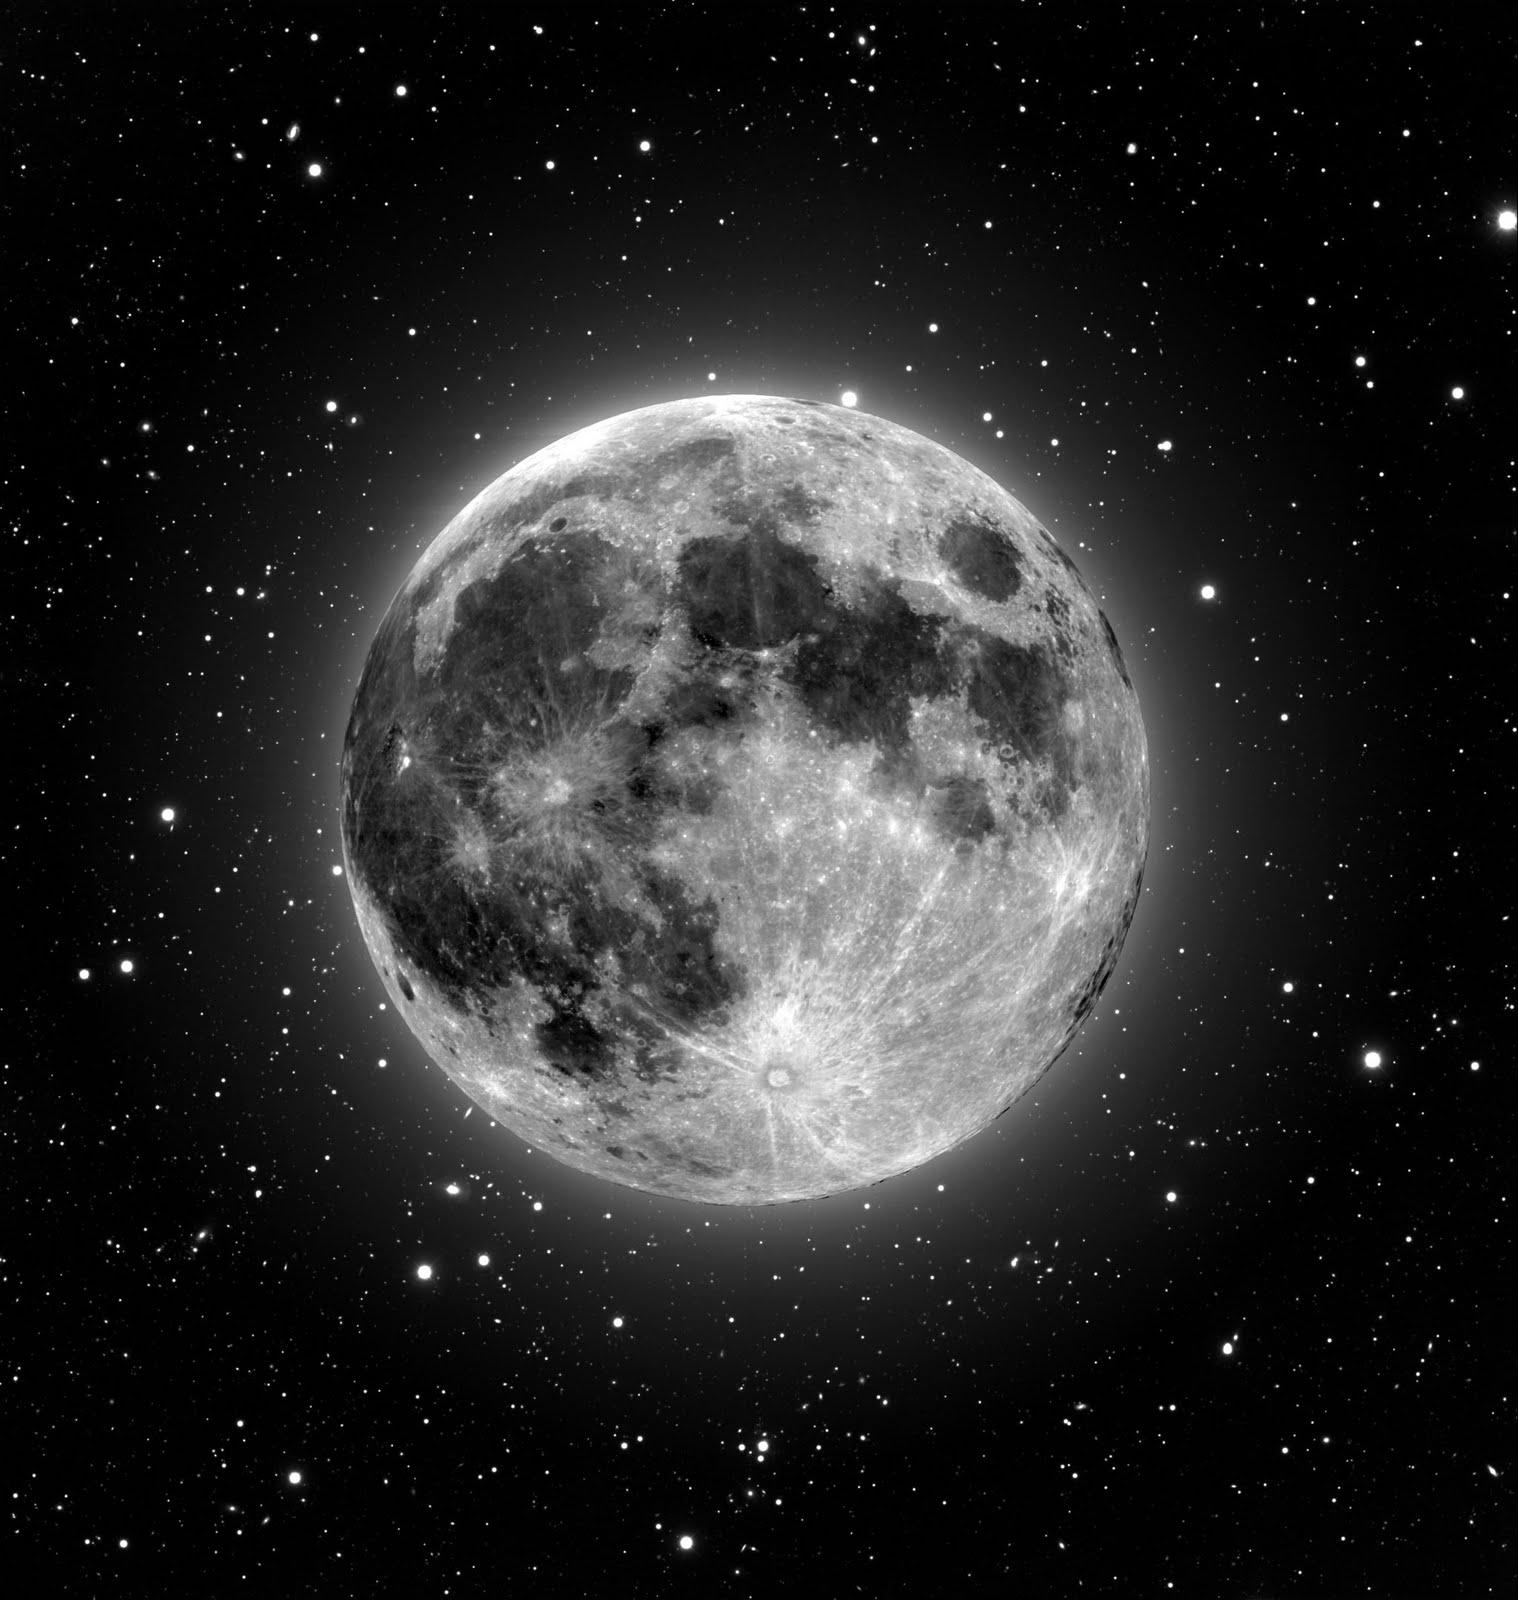 http://3.bp.blogspot.com/_MwNvQVURovg/S_KRRZB9OMI/AAAAAAAAAbE/ewWtFv-4M3Q/s1600/noao_moon_stars.jpg